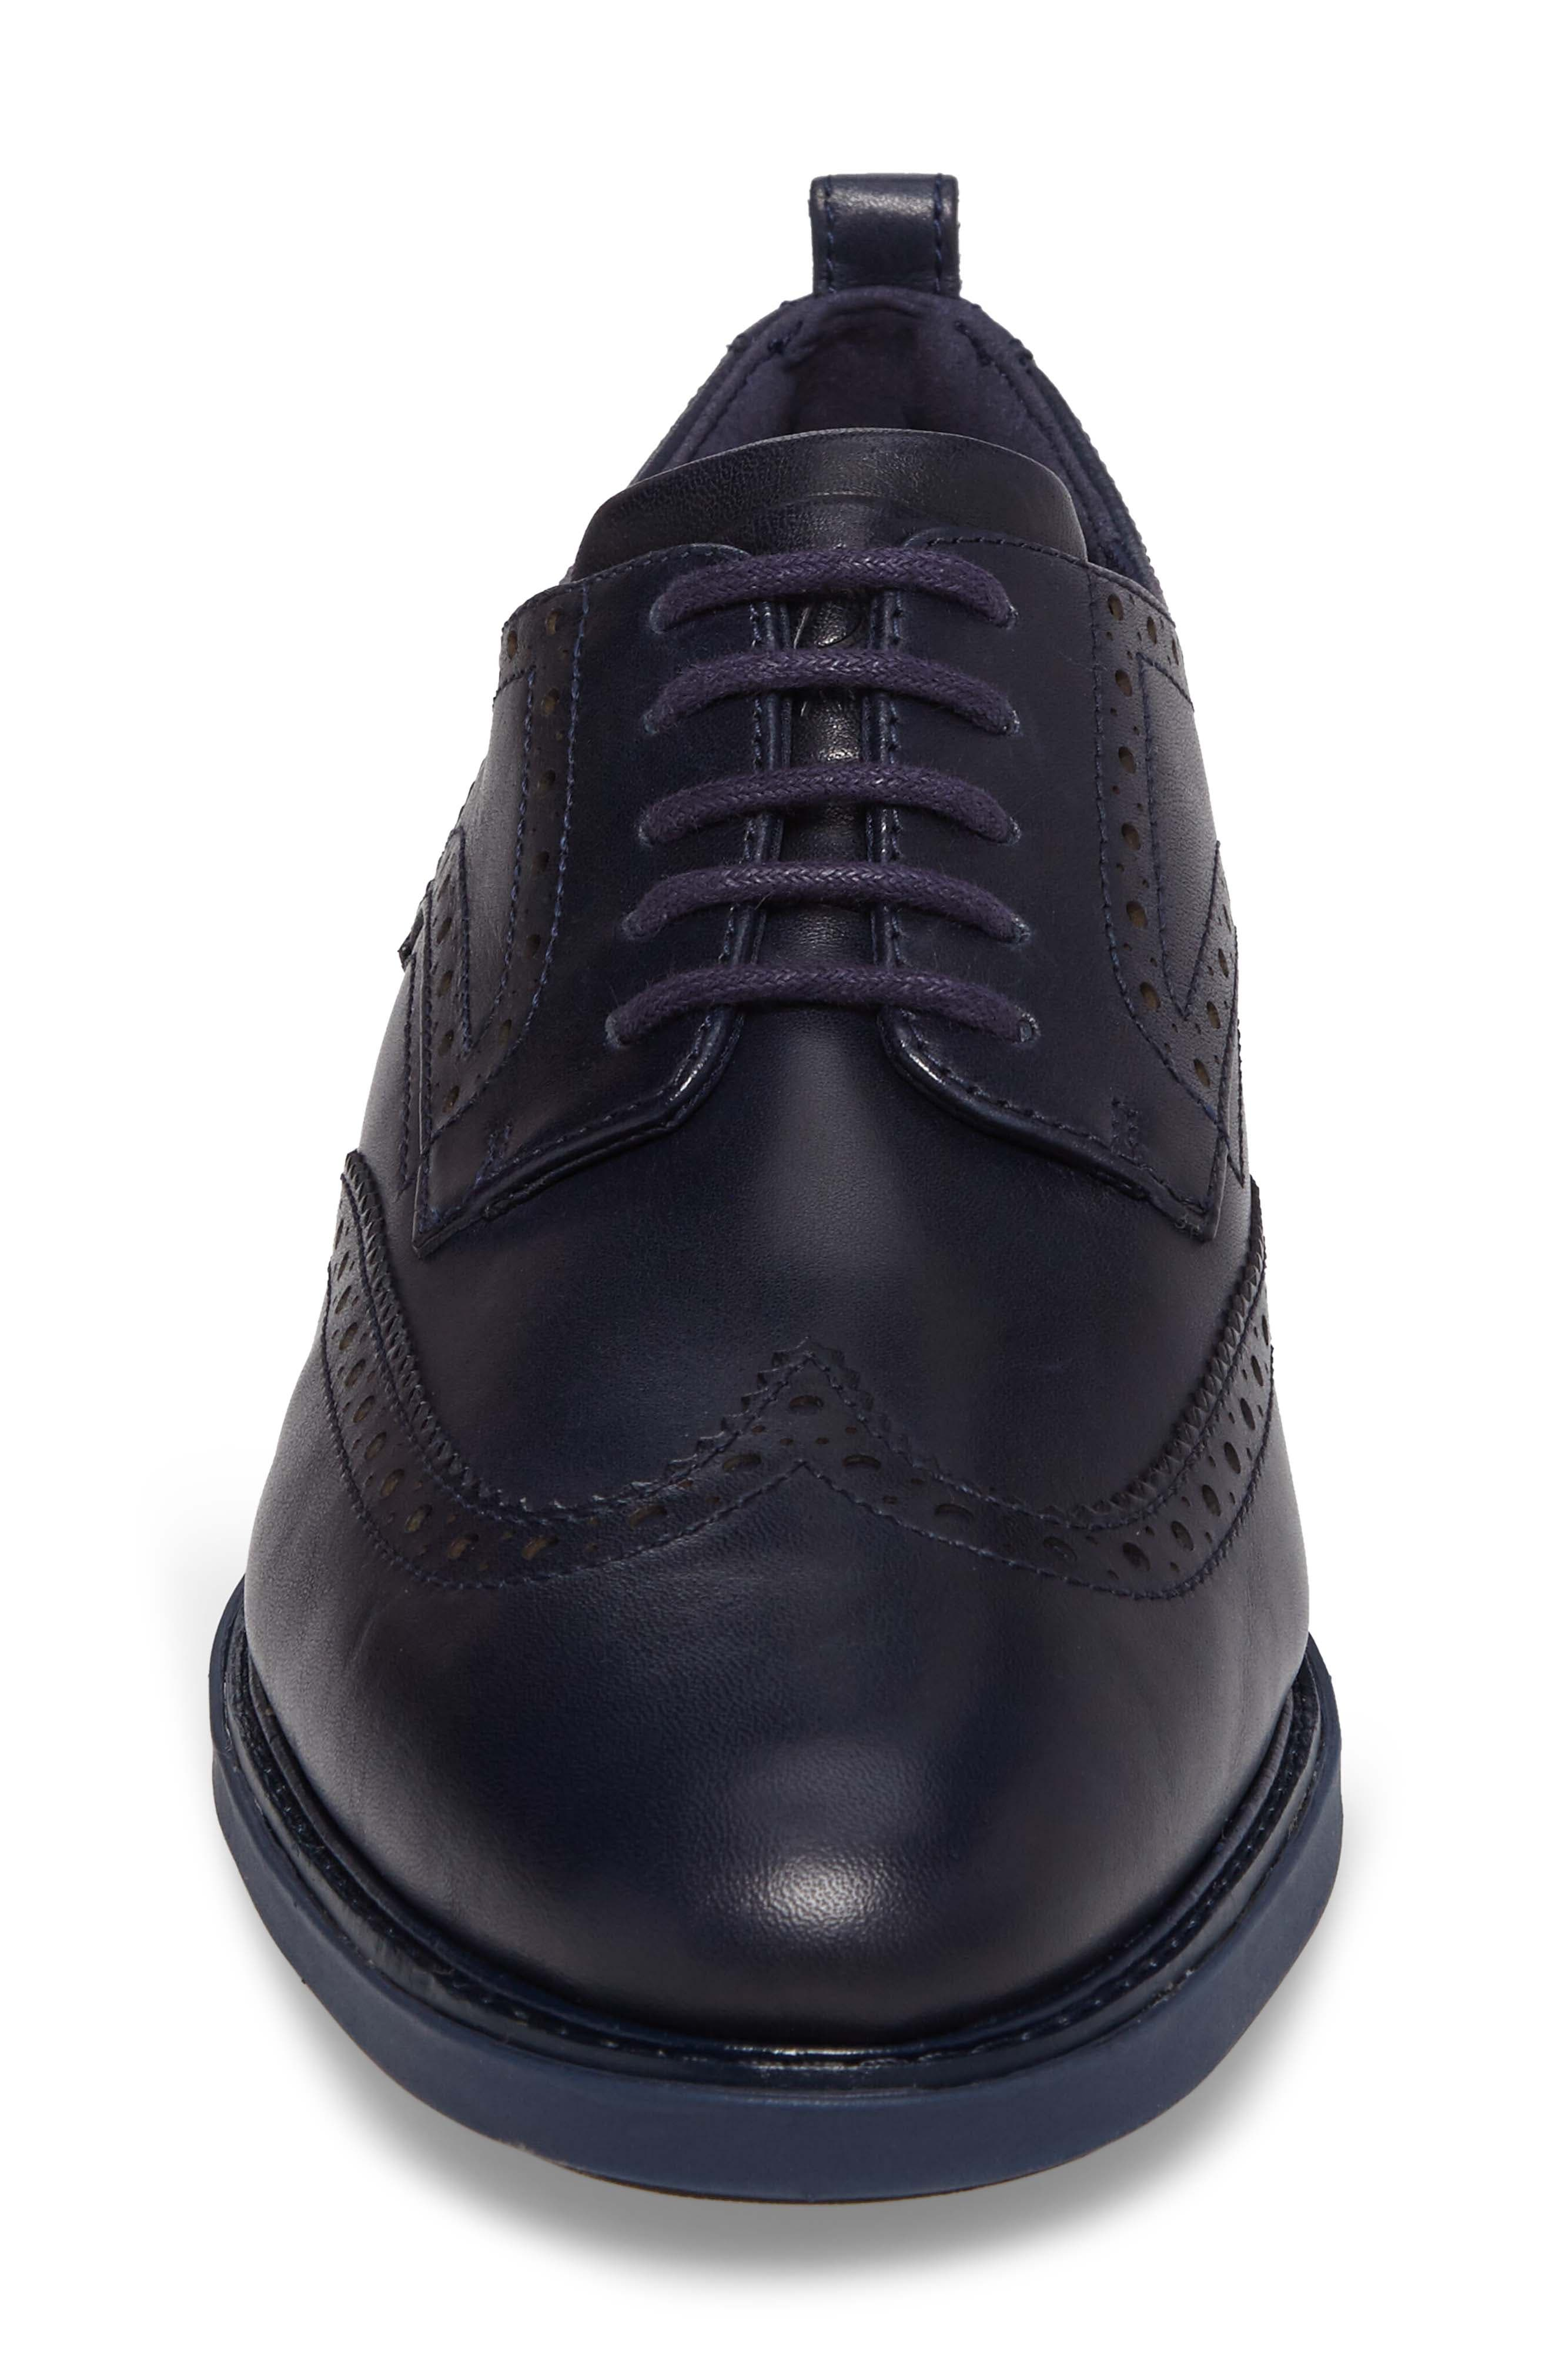 Grand Evolution Wingtip,                             Alternate thumbnail 4, color,                             Marine Blue/ Black Leather